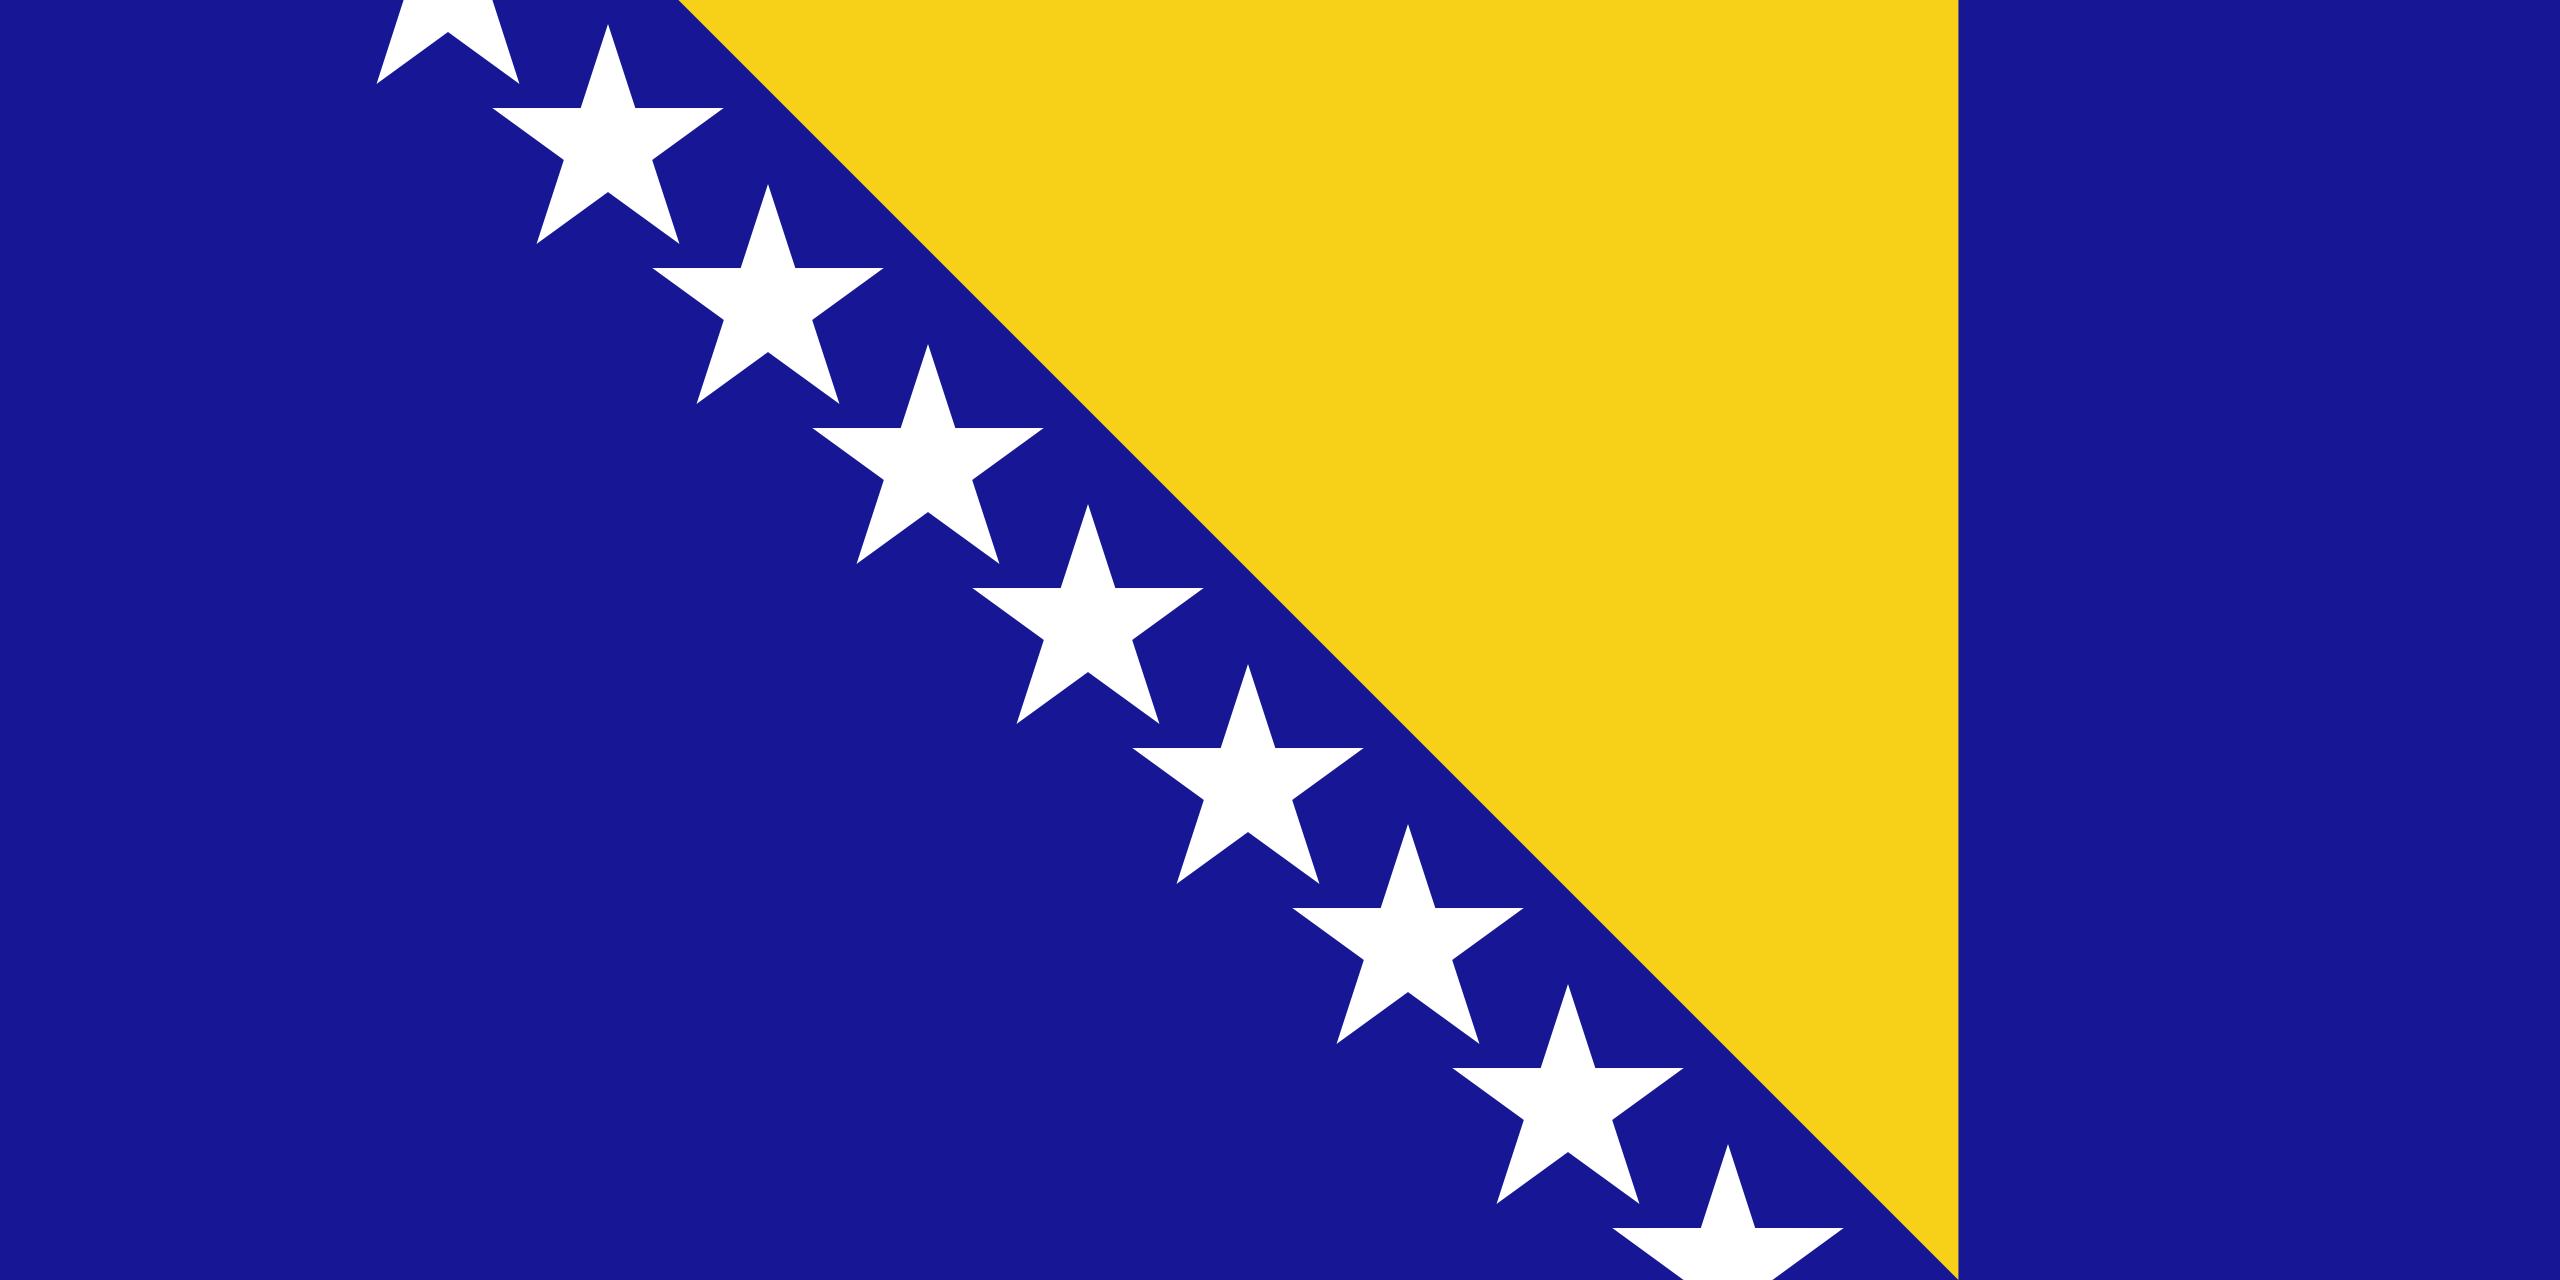 Bosnia y Herzegovina - bandera